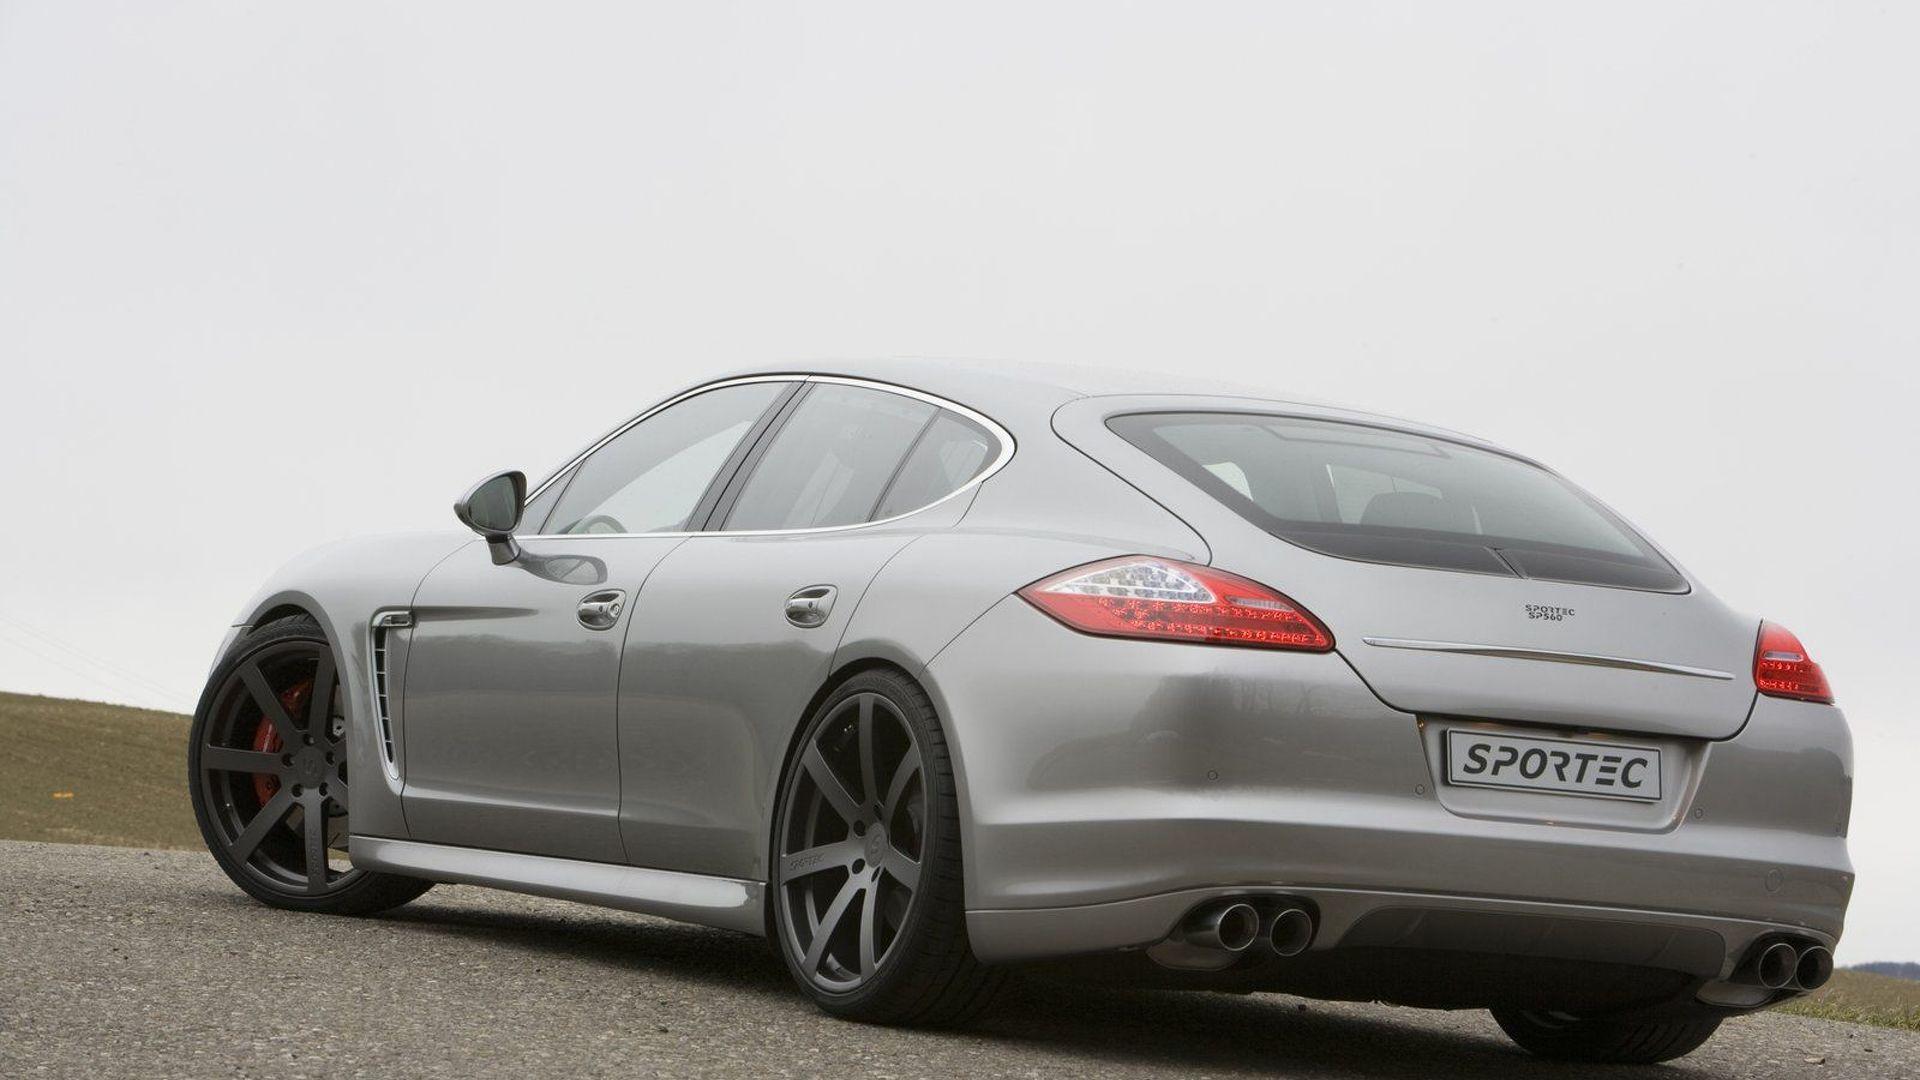 Sportec SP560 Tuning Upgrades Announced for Porsche Panamera Turbo